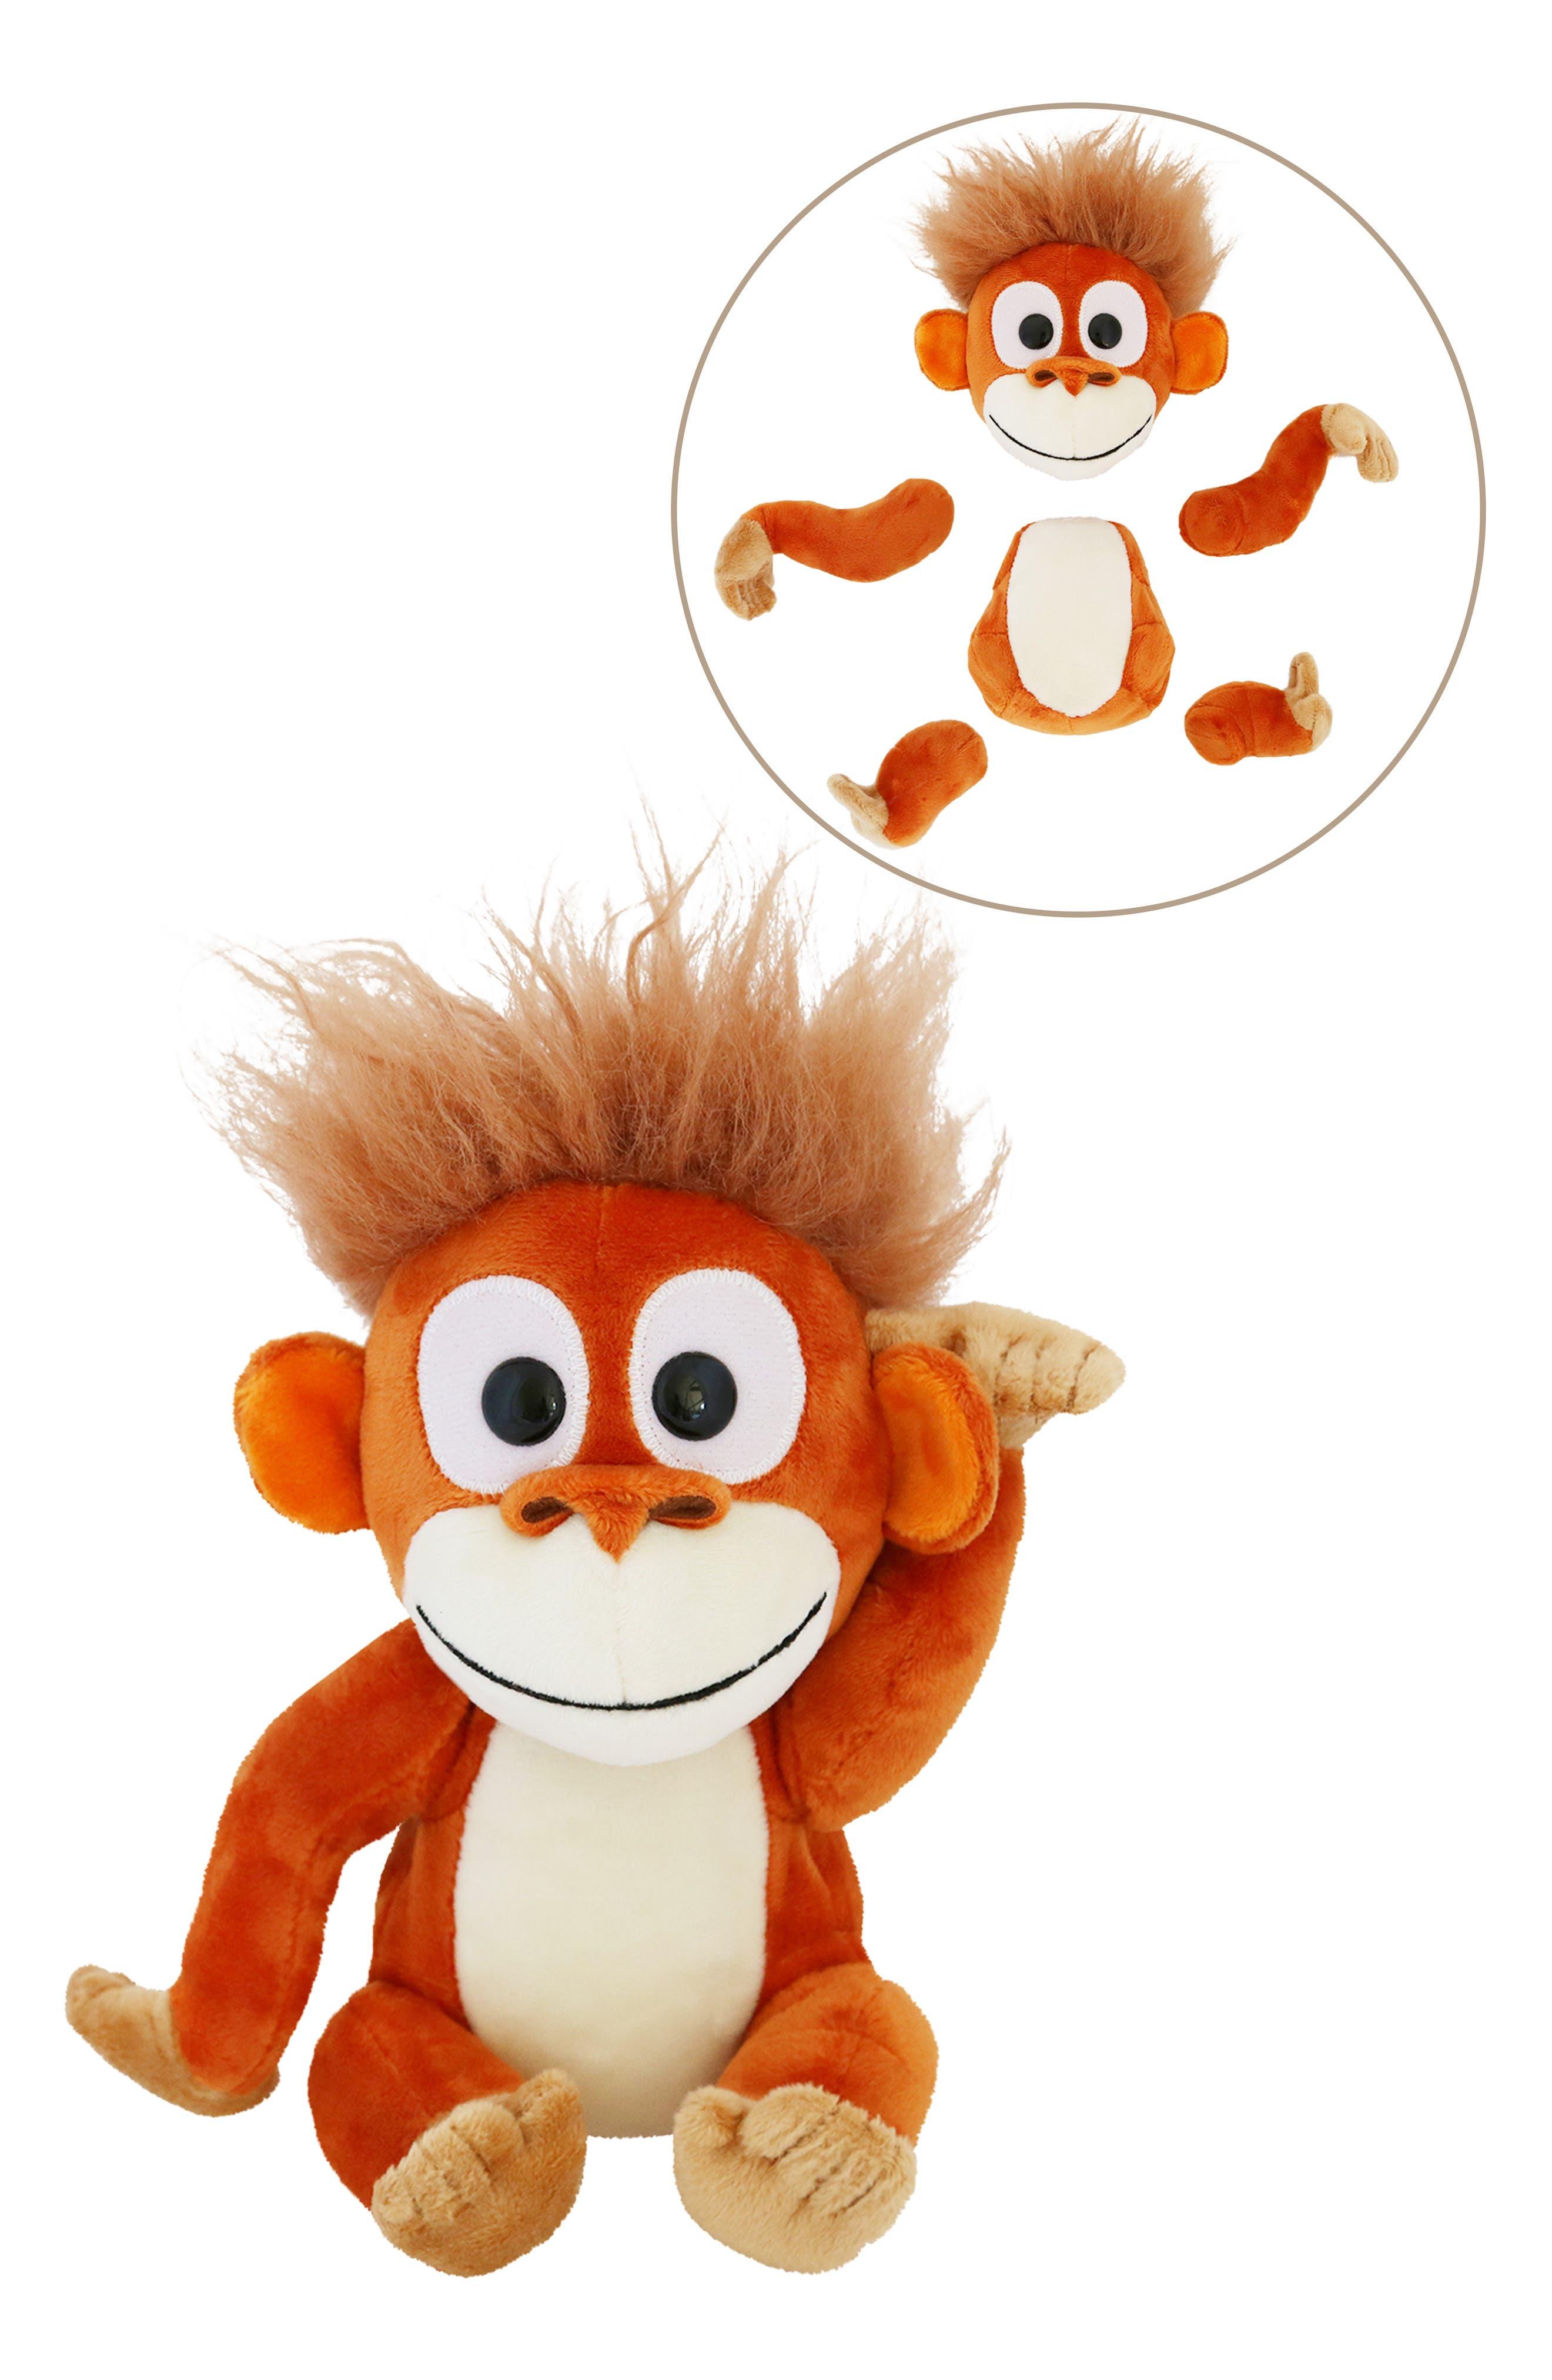 Animoodles Randy Orangutan Magnetic Stuffed Animal Nordstrom